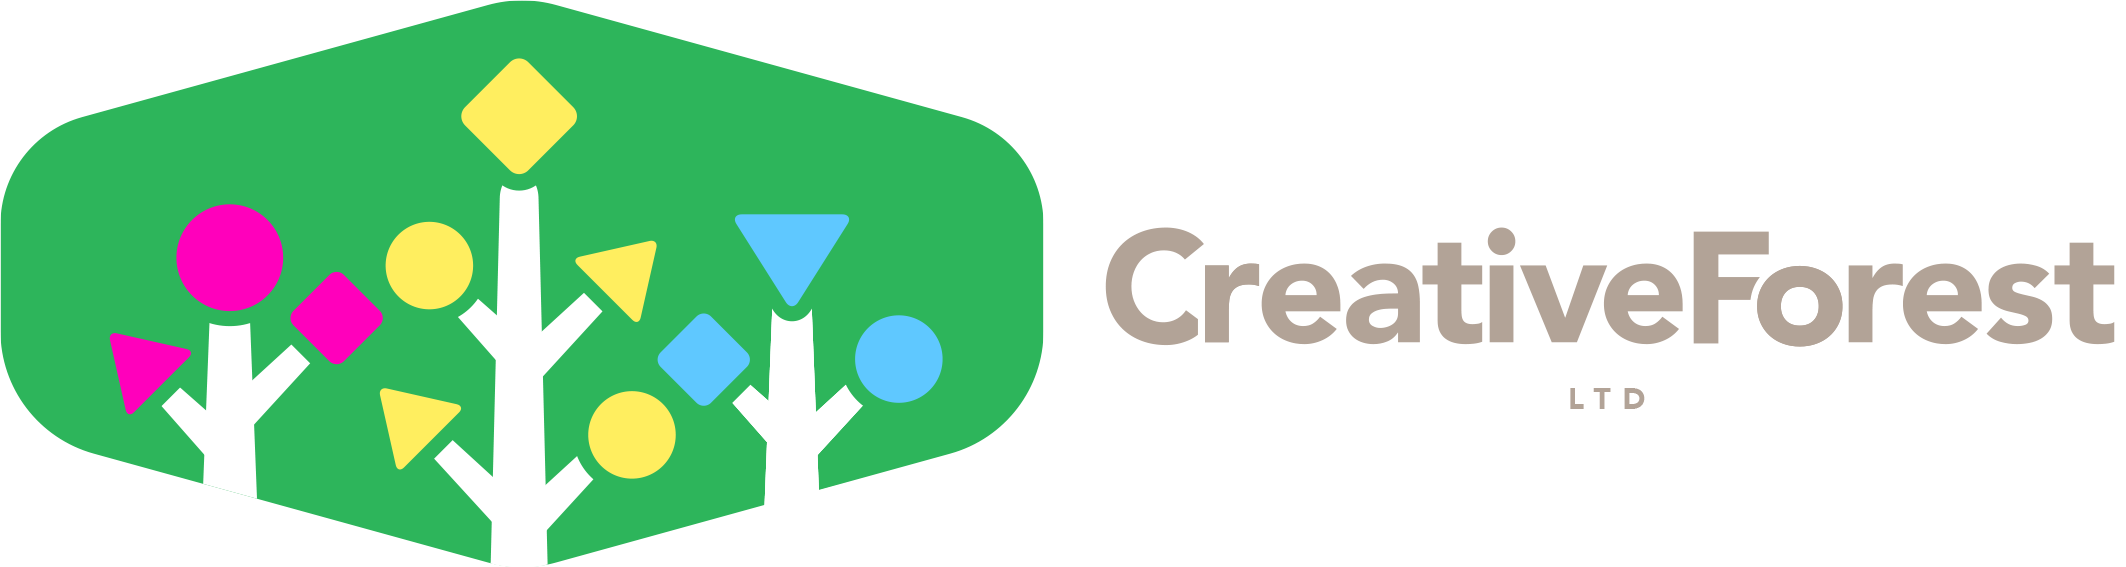 Creative Forest Ltd